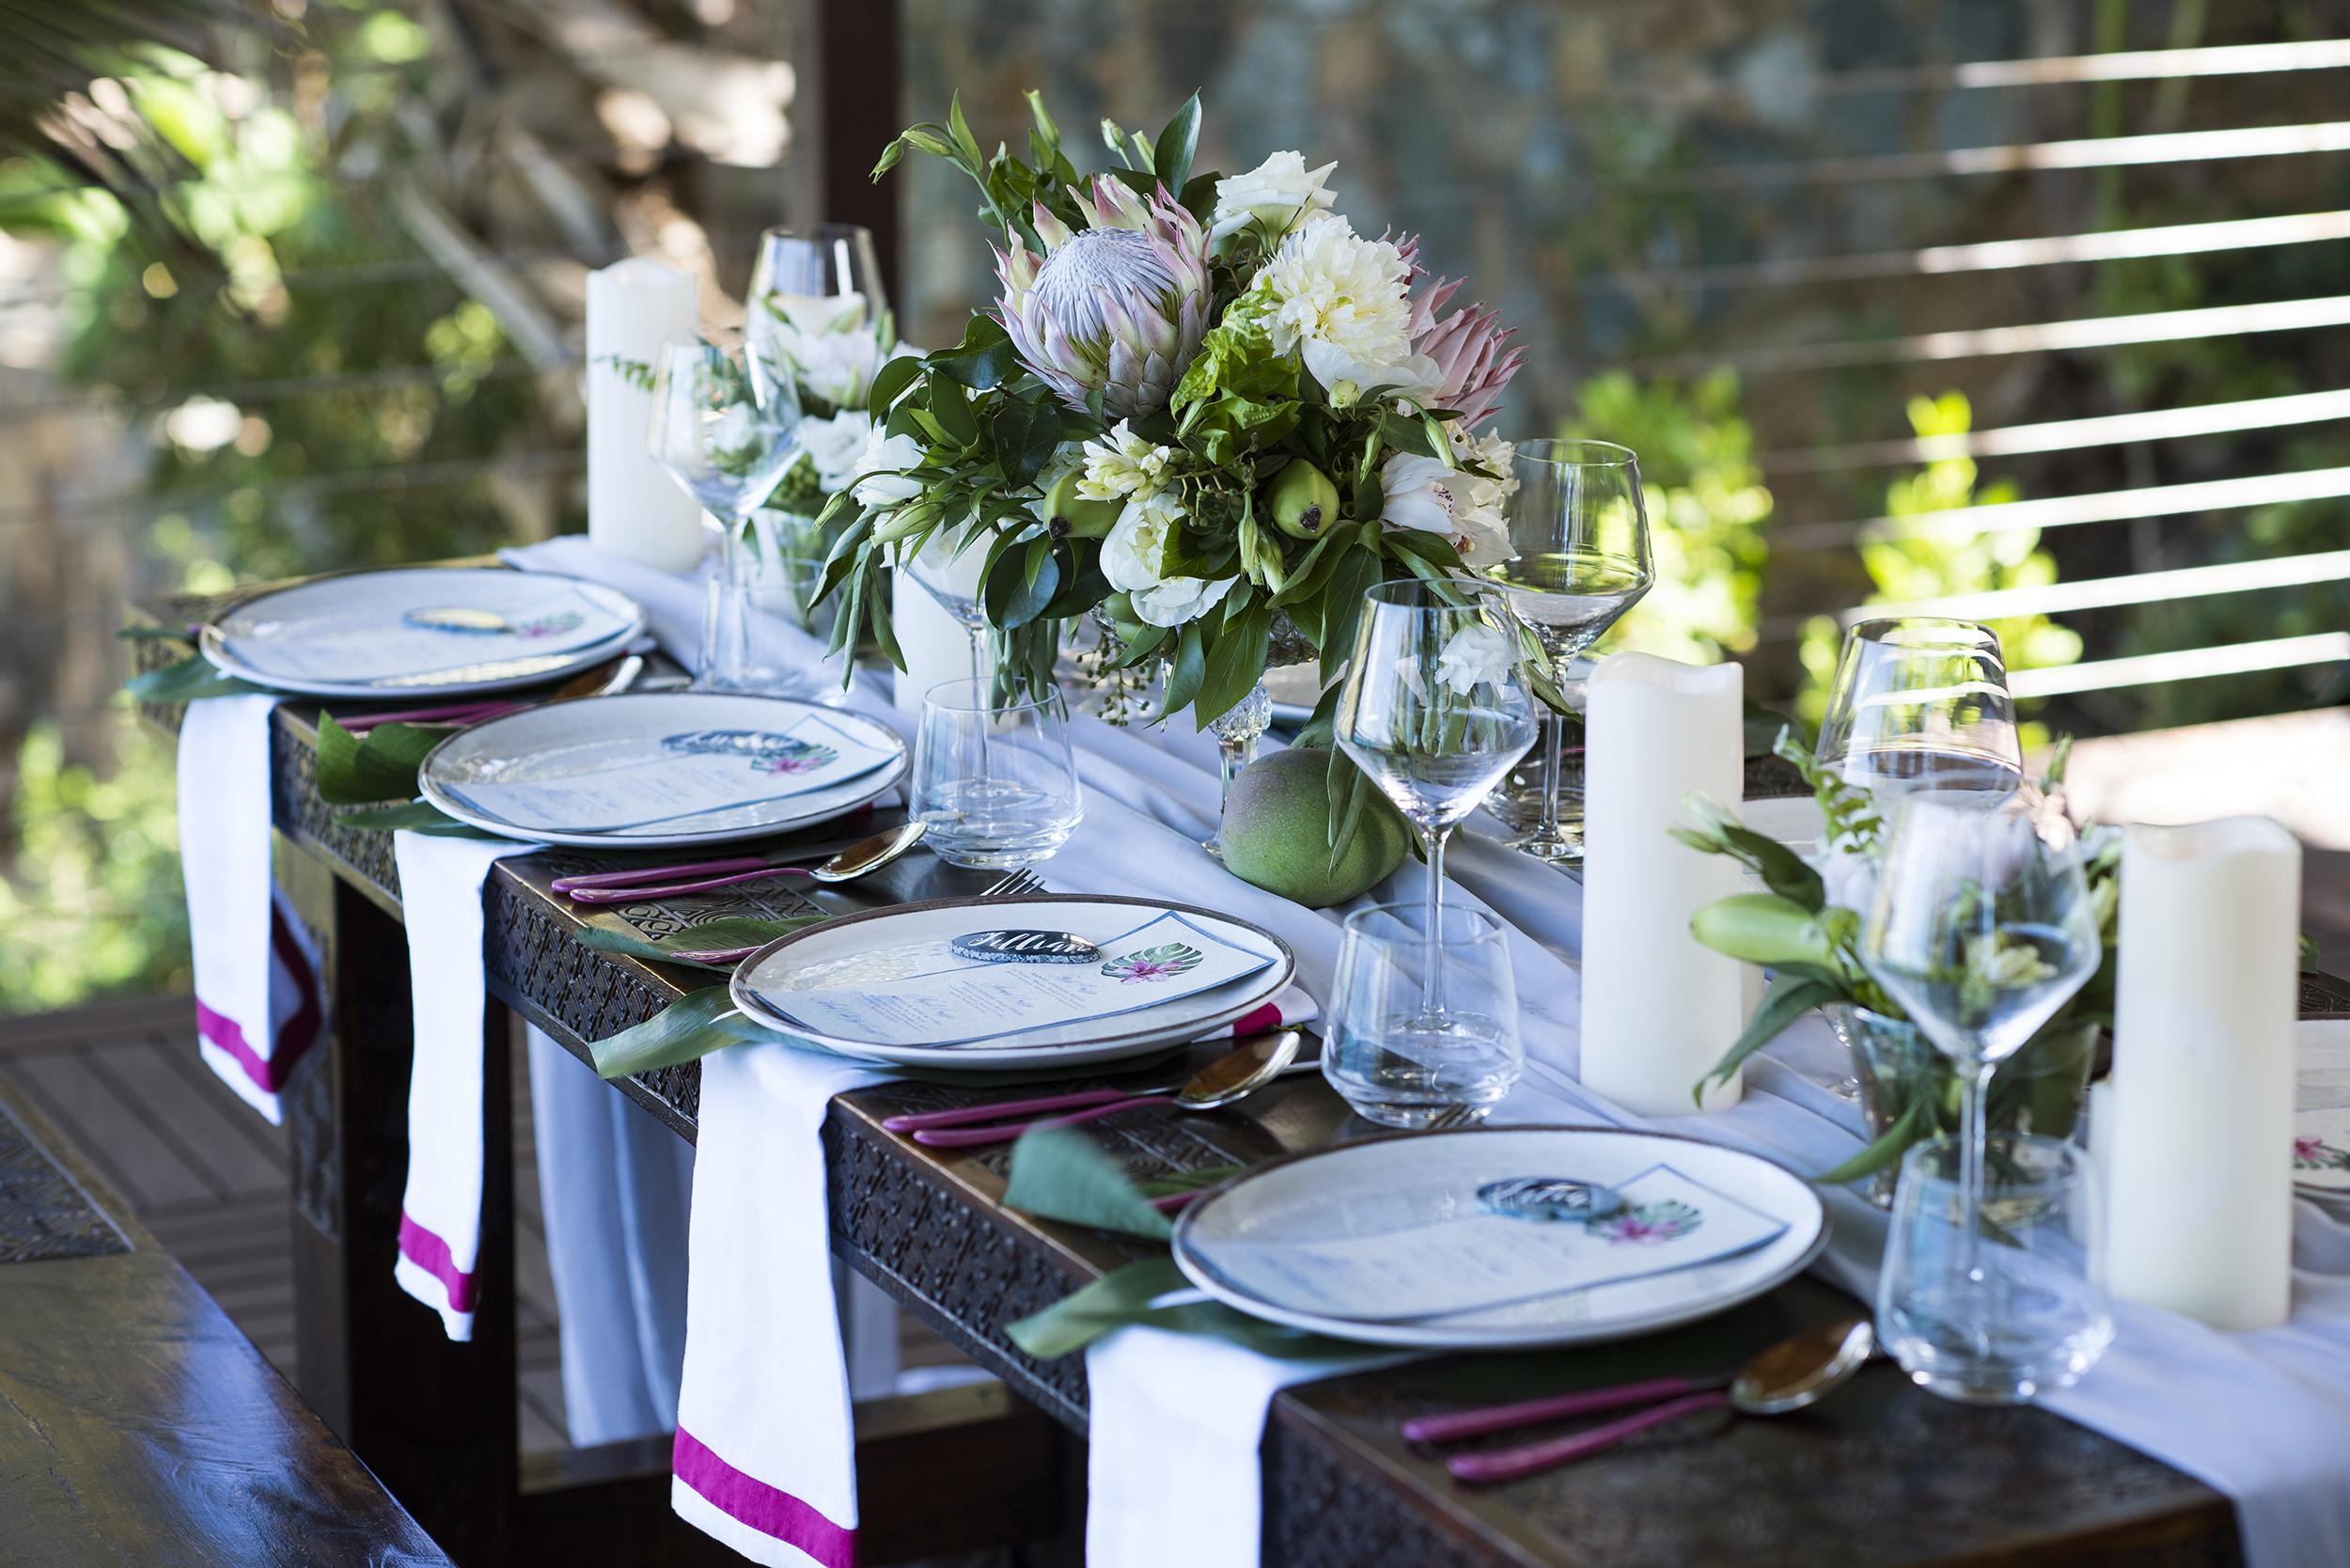 Villa Norbu Wedding Vendors - Place to hold a wedding on St. Thomas